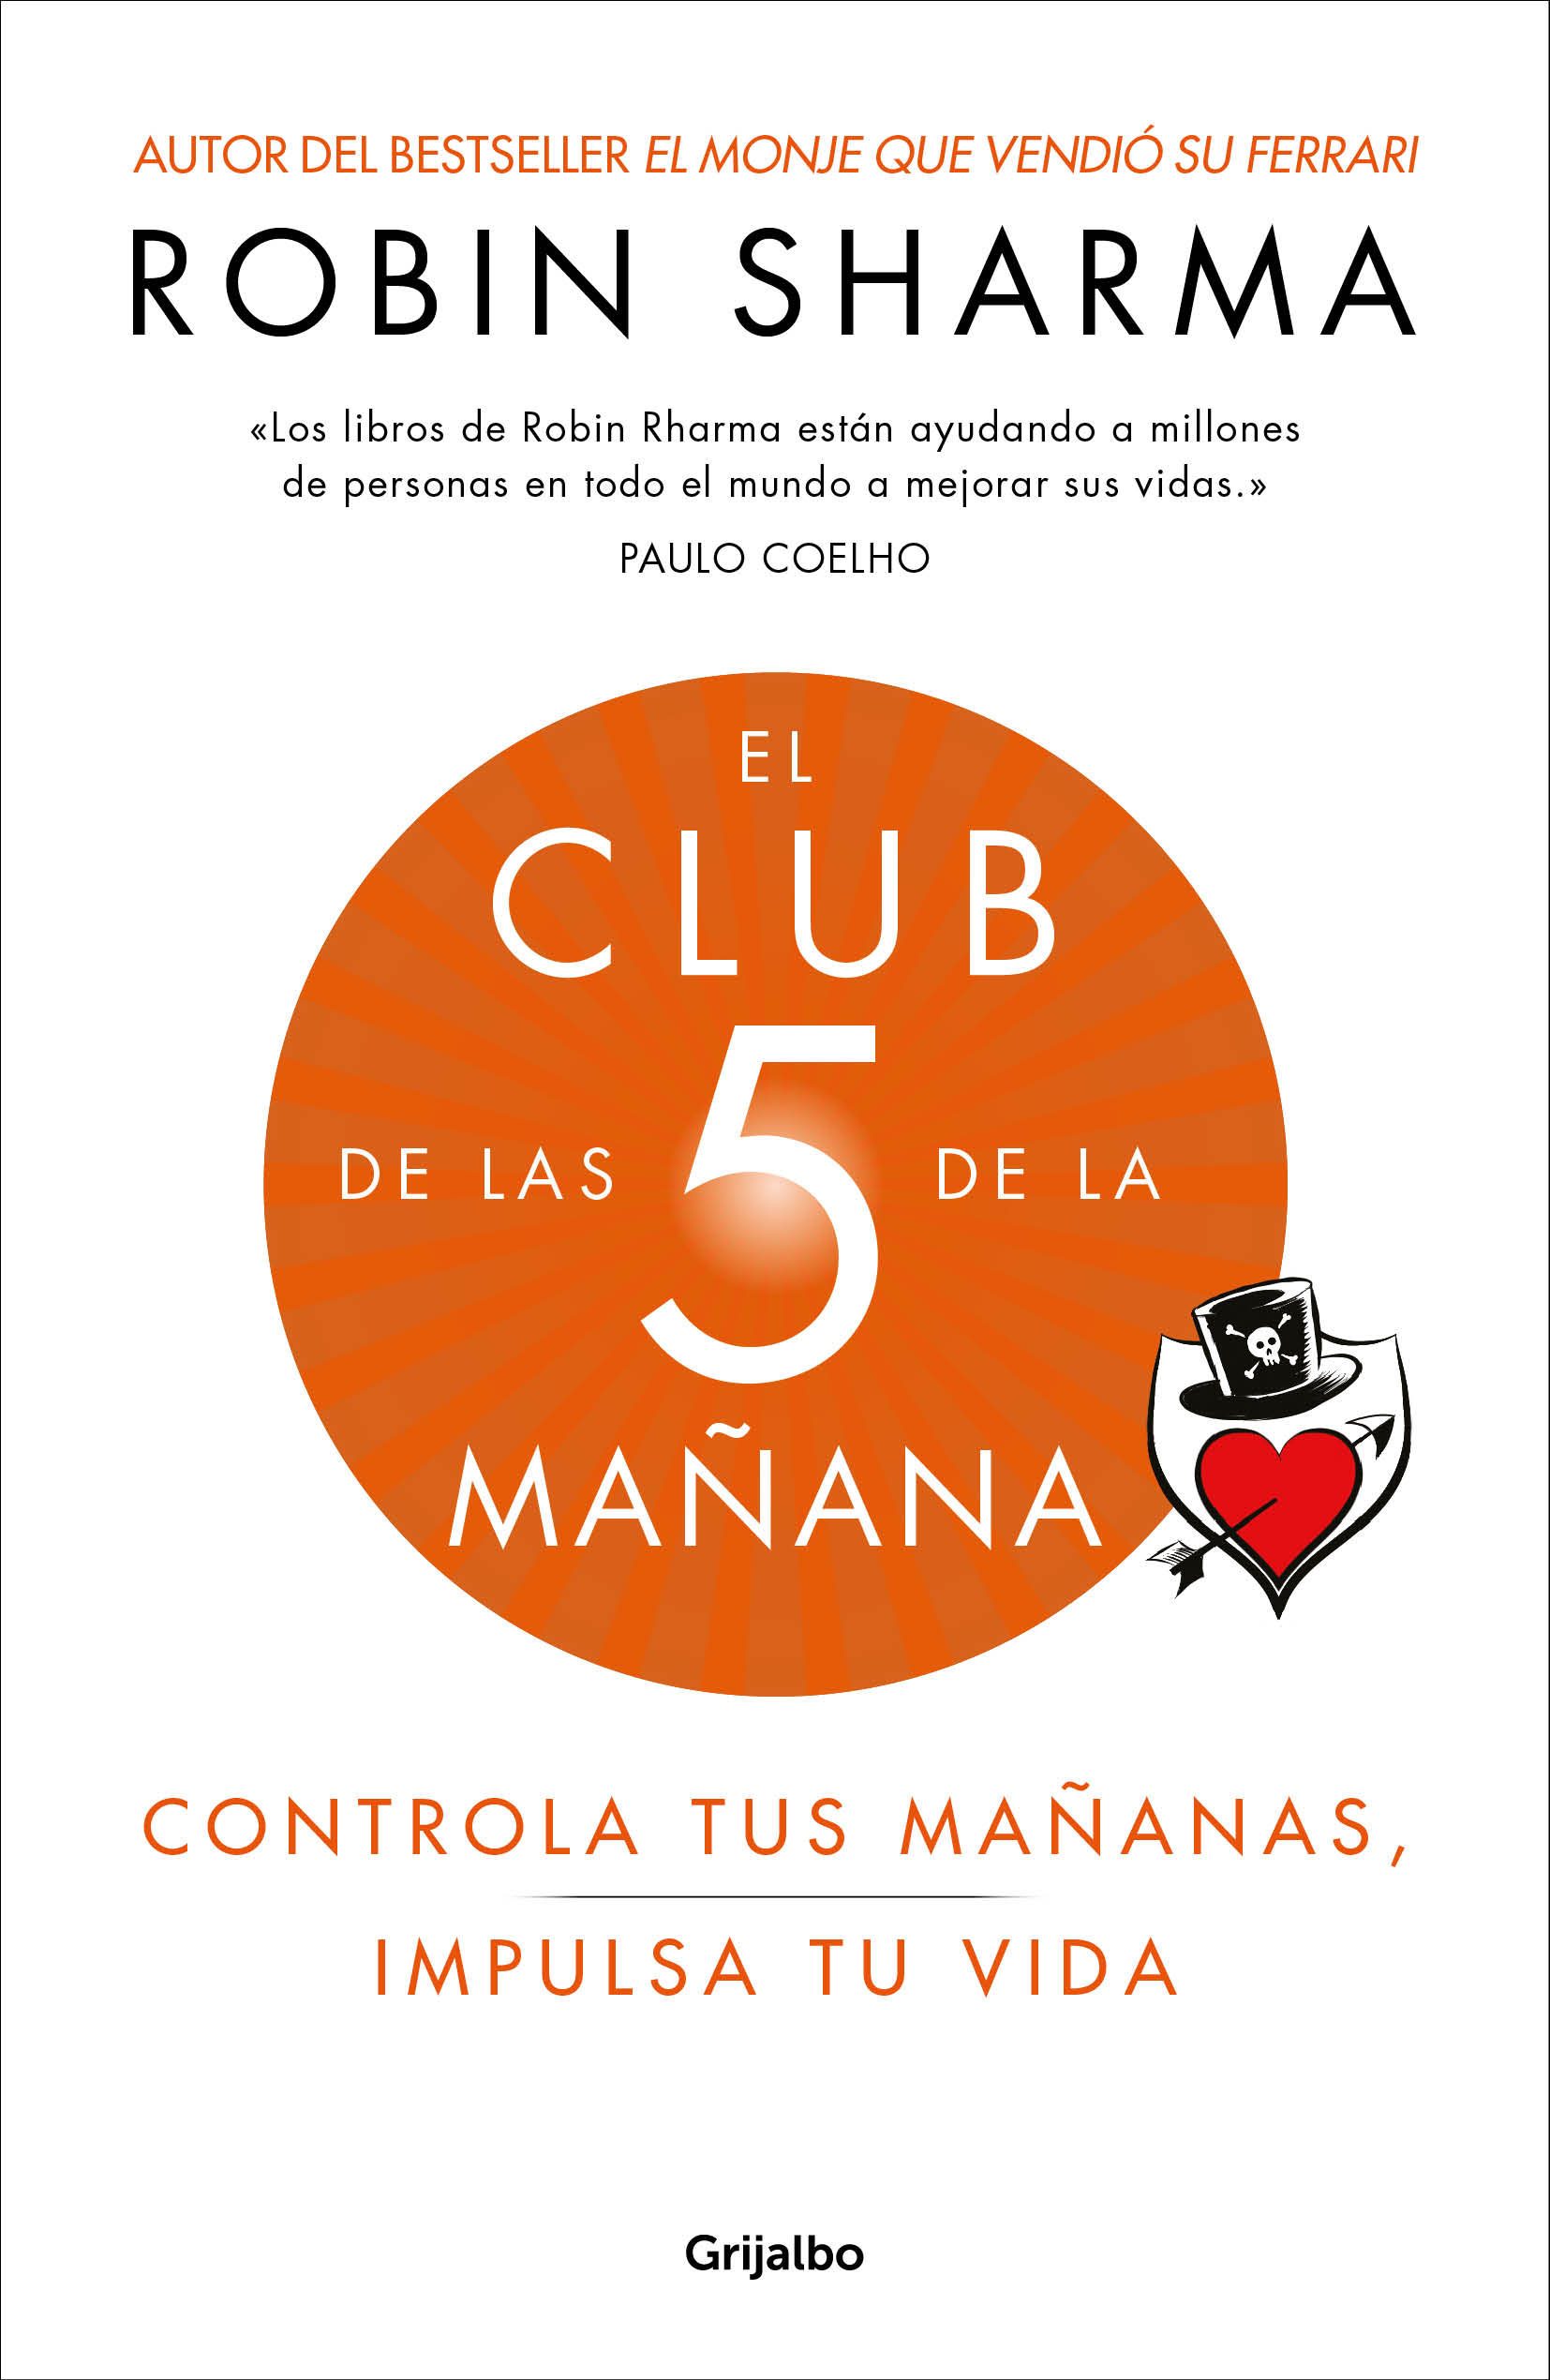 EL CLUB DE LAS 5 DE LA MAÑANA. Controla tus mañanas, impulsa tu vidaSHARMA,  ROBIN